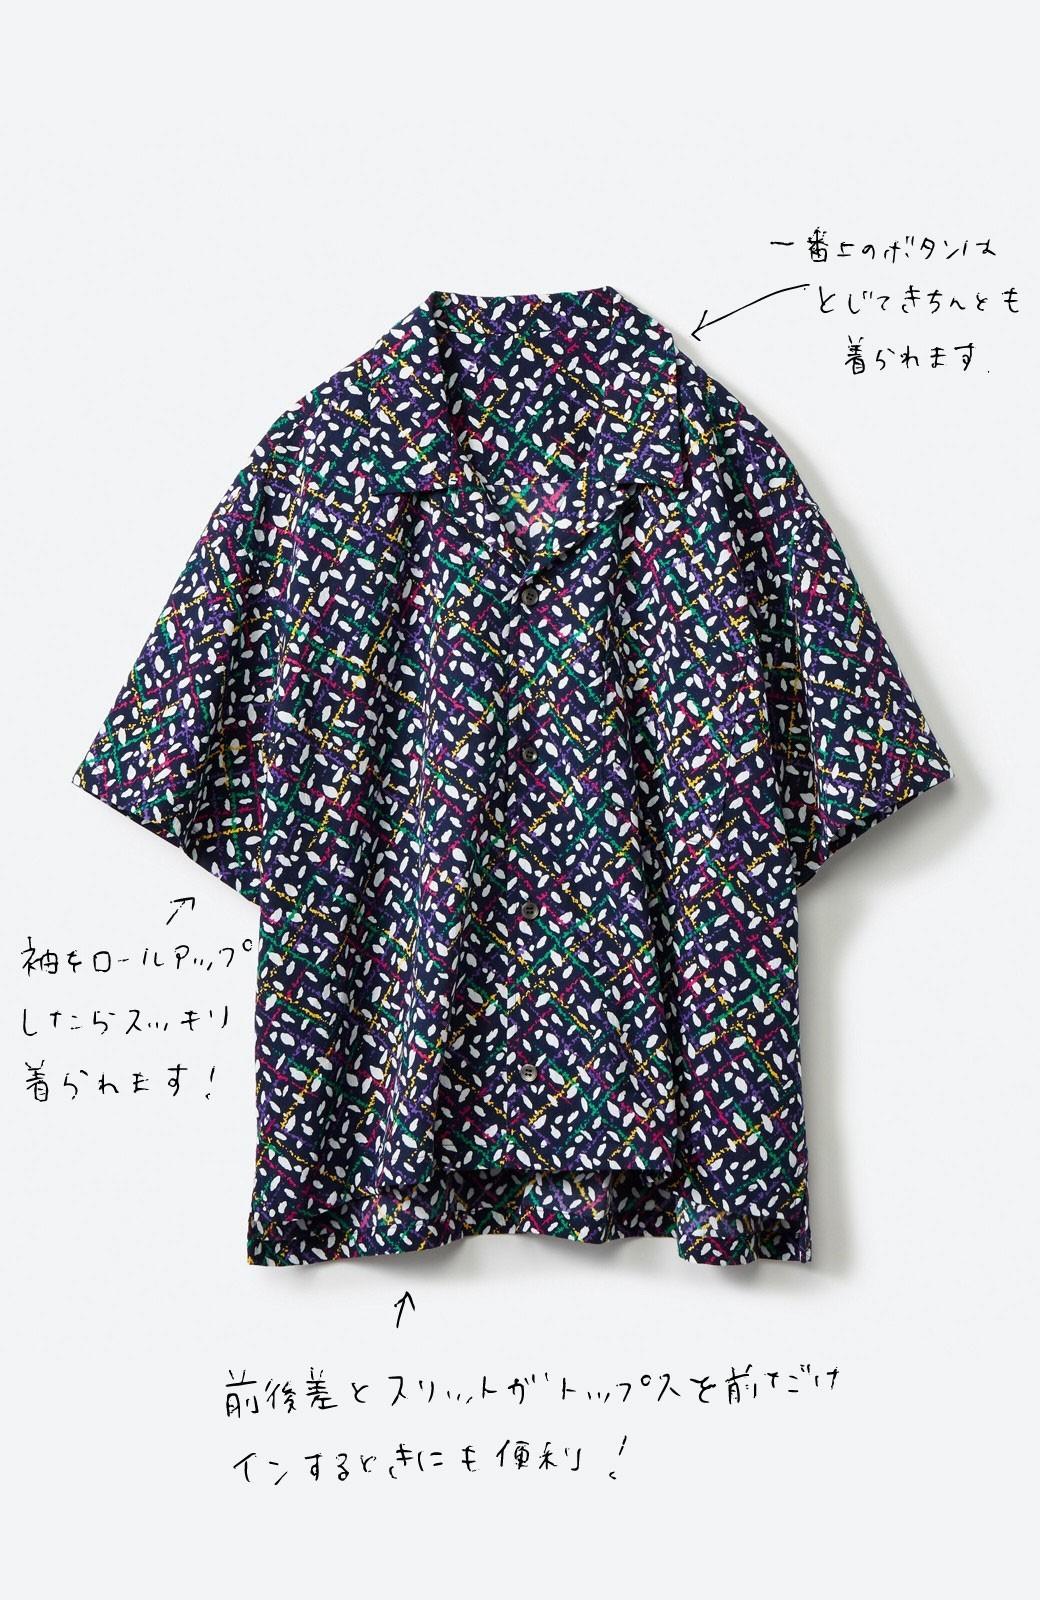 haco! 【今年も再販!】京都の浴衣屋さんと作った浴衣生地のシャツ <ネイビー>の商品写真3